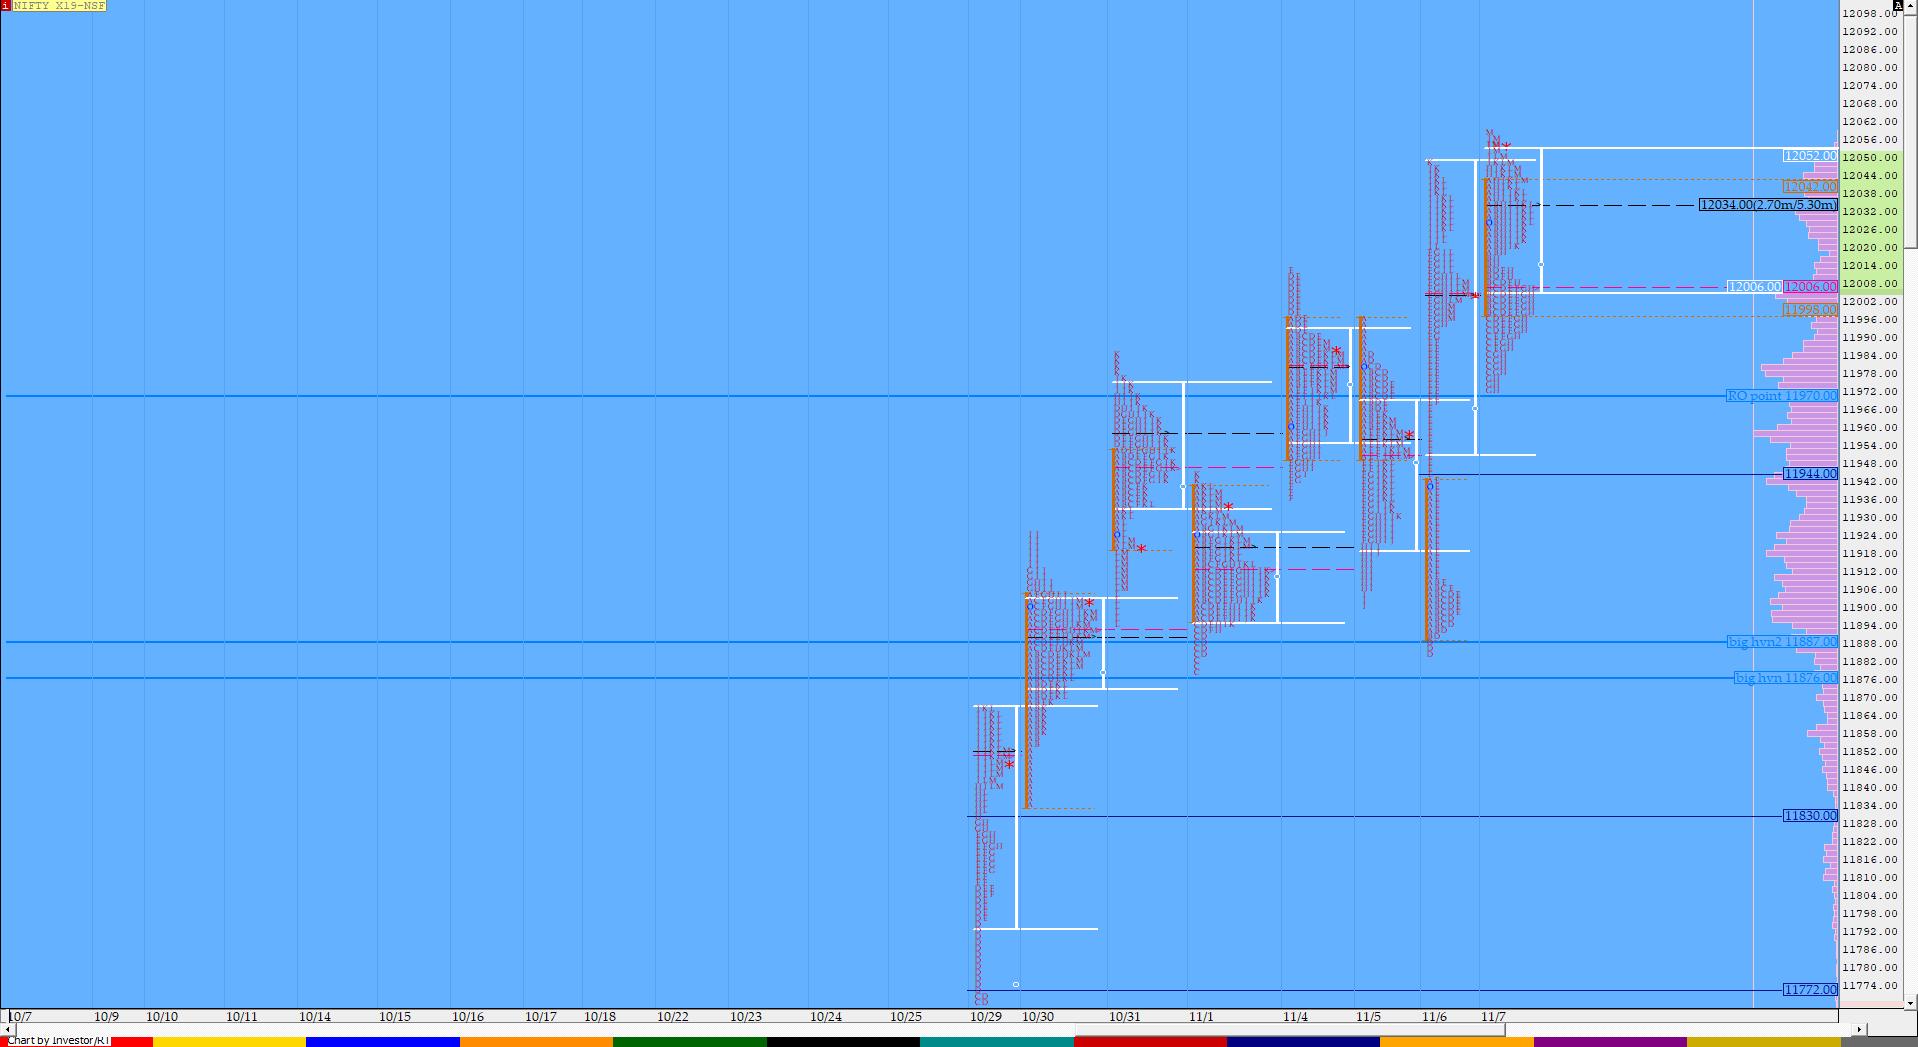 Market Profile Analysis dated 7th November 2